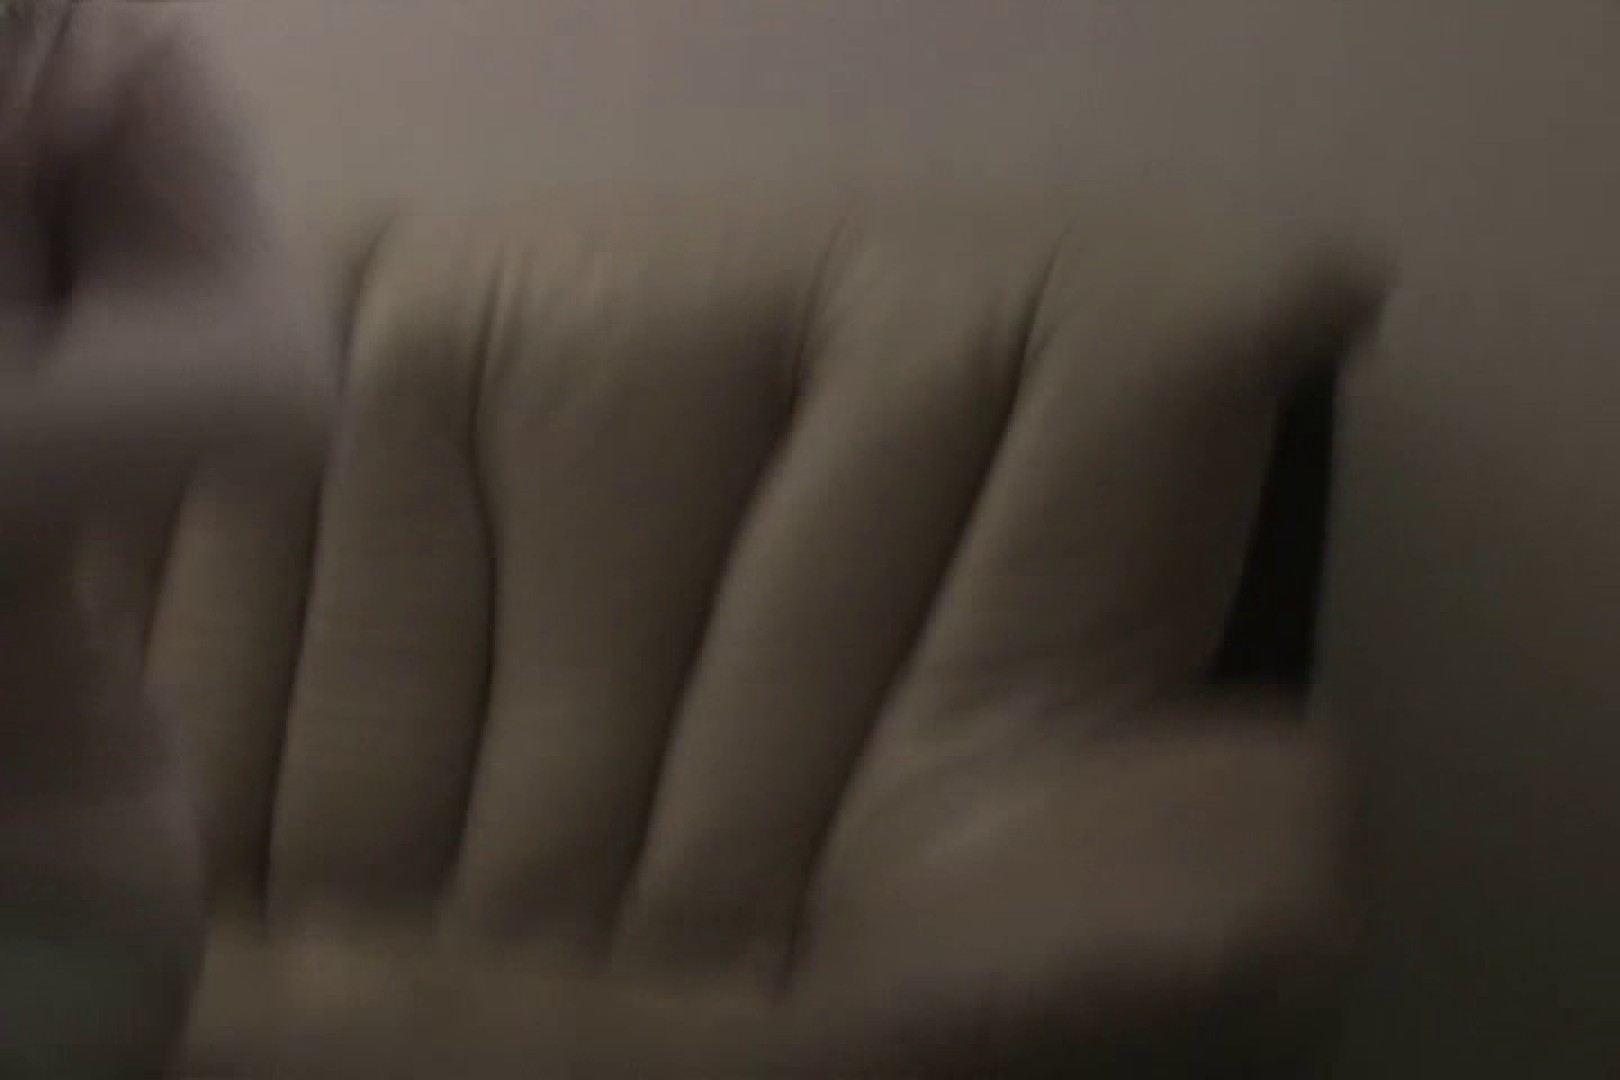 Hするために生まれてきたようなイキまくりの極エロ人妻~小池ゆり~ 熟女  108連発 49